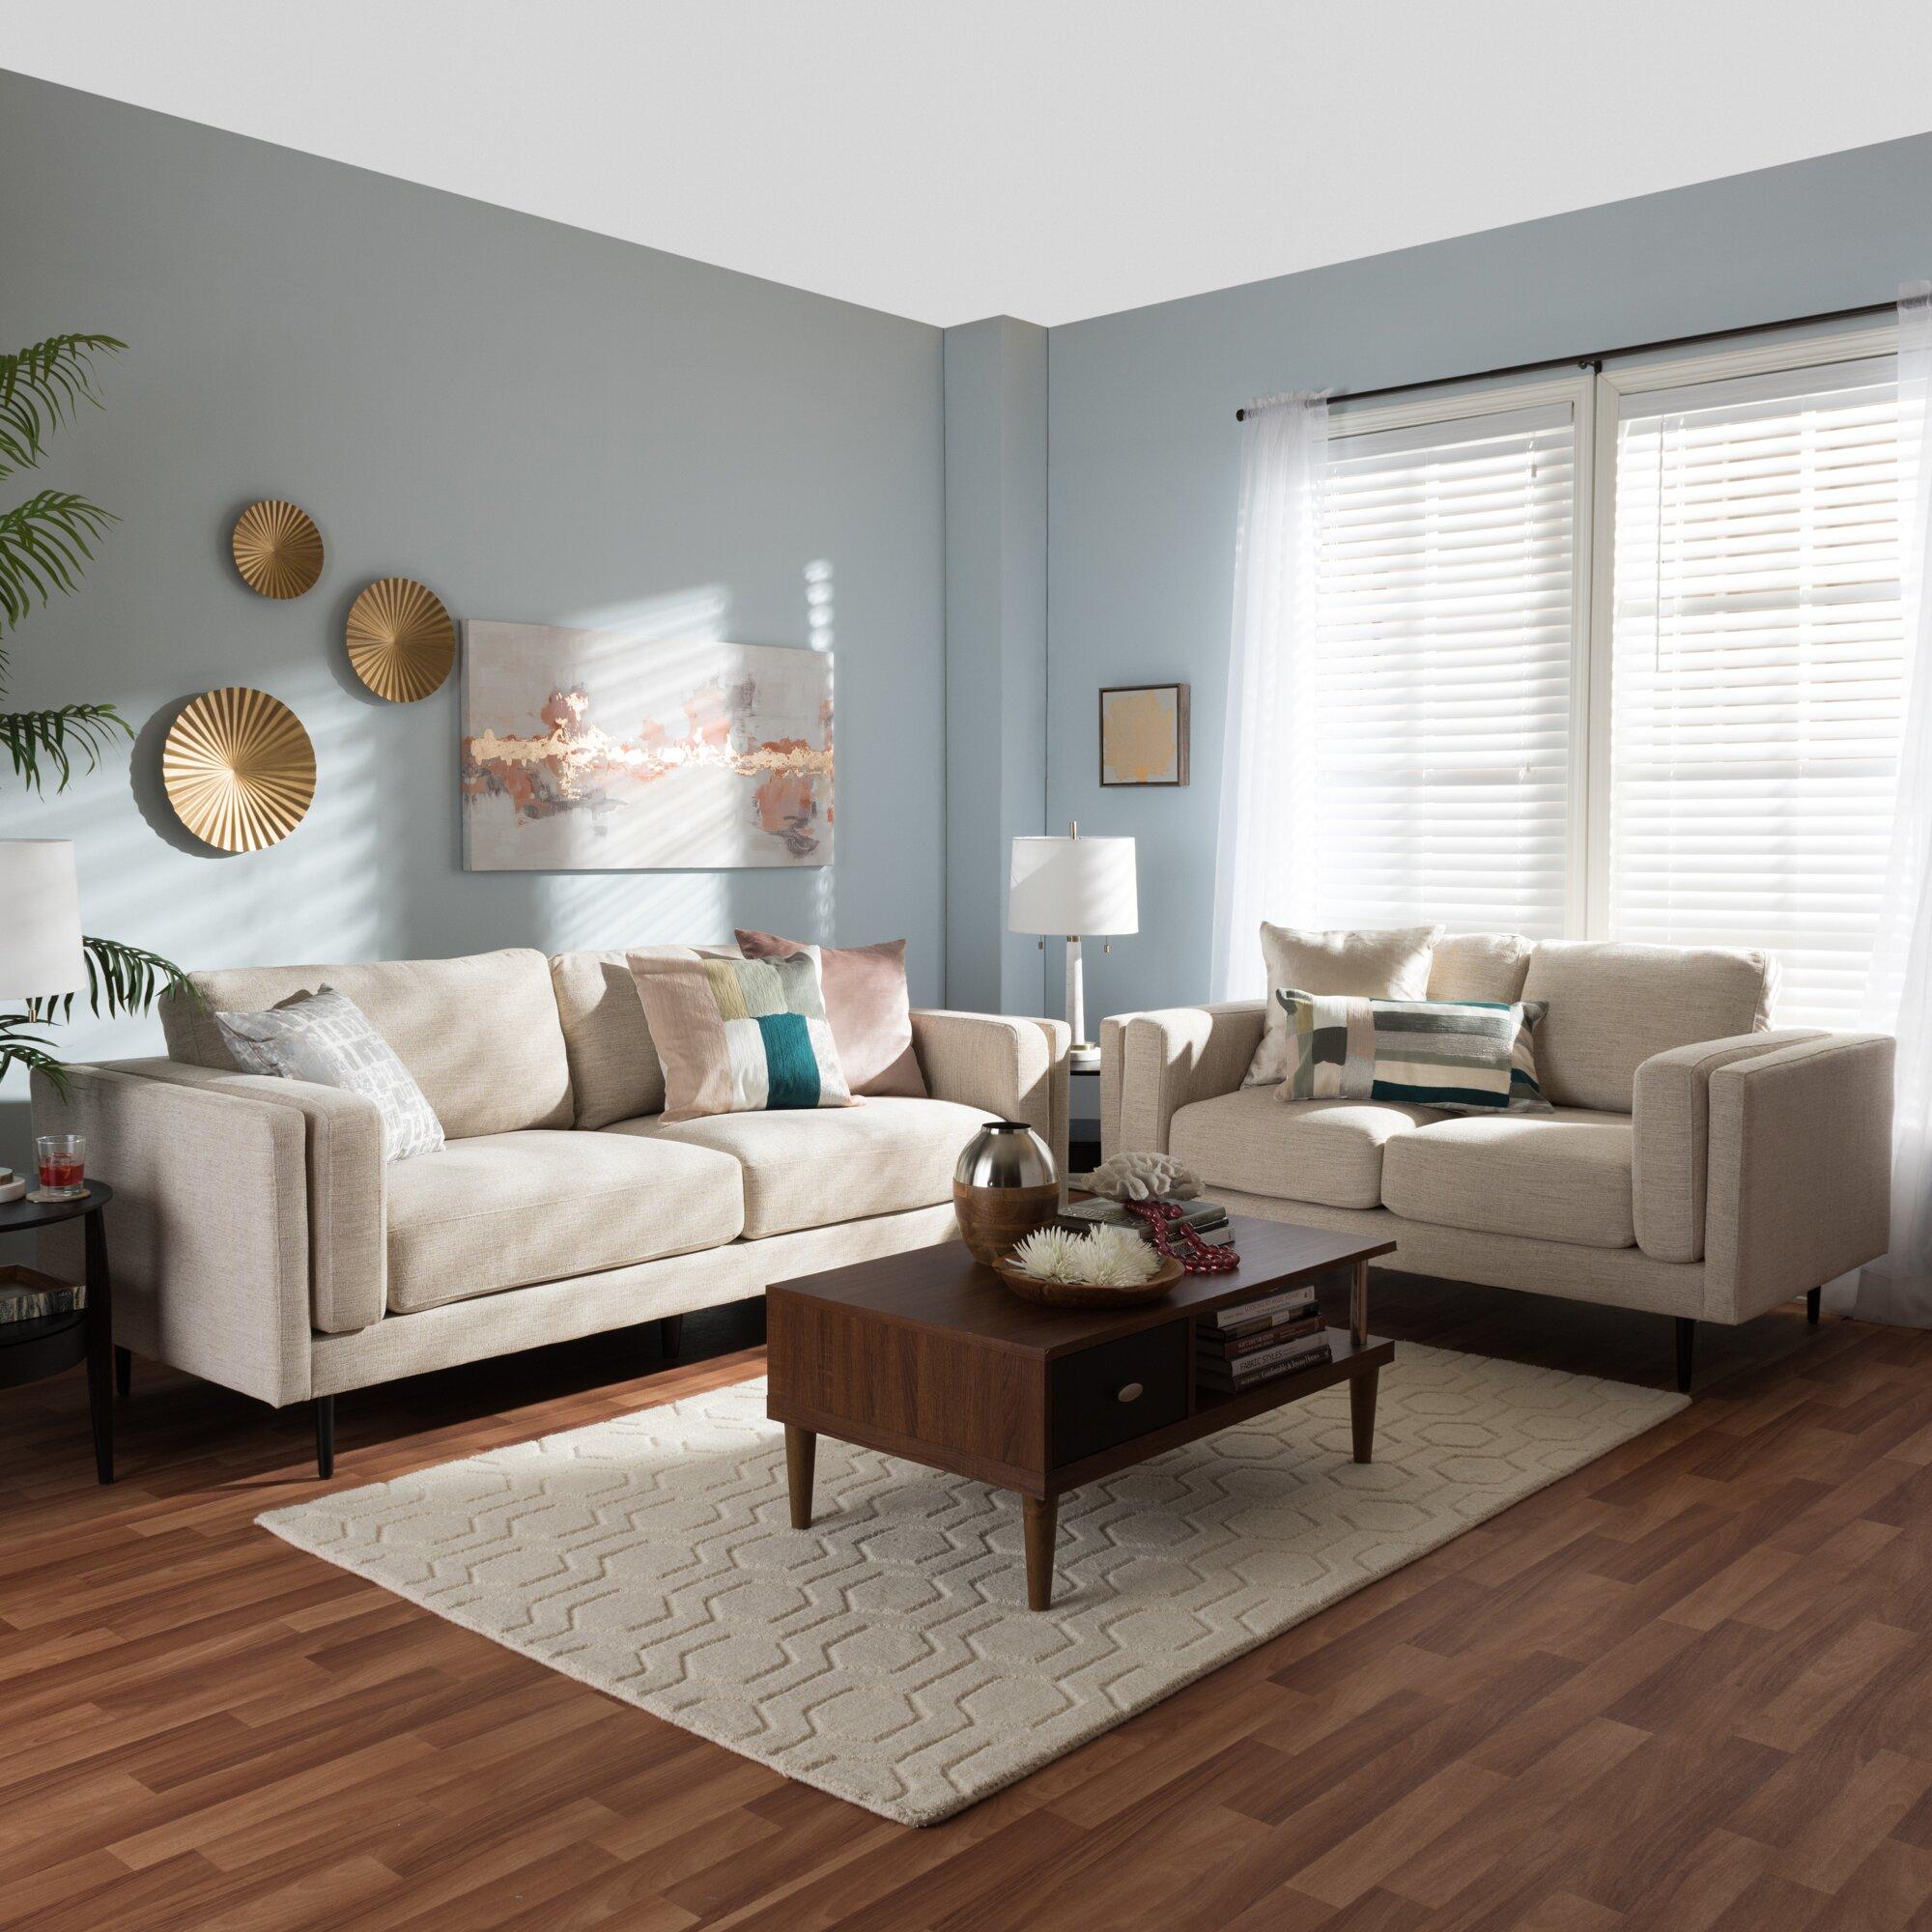 wholesale interiors baxton studio brittany retro mid